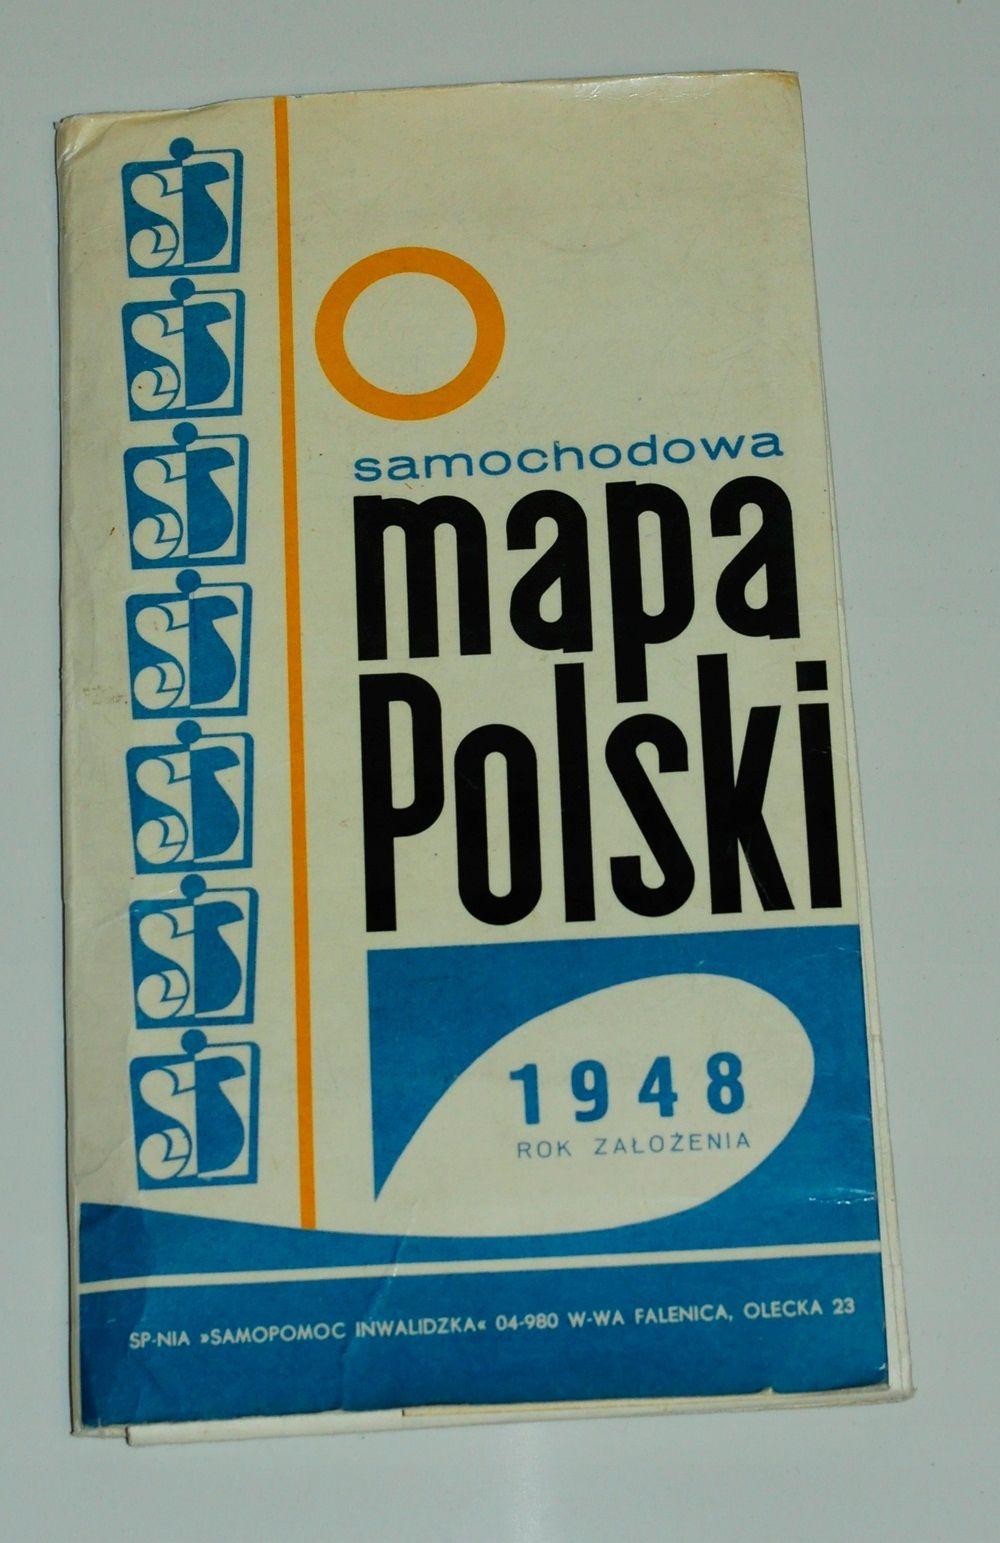 Samochodowa Mapa Polski Z 1977r Oldshool 7677031034 Oficjalne Archiwum Allegro Book Cover Books Cover